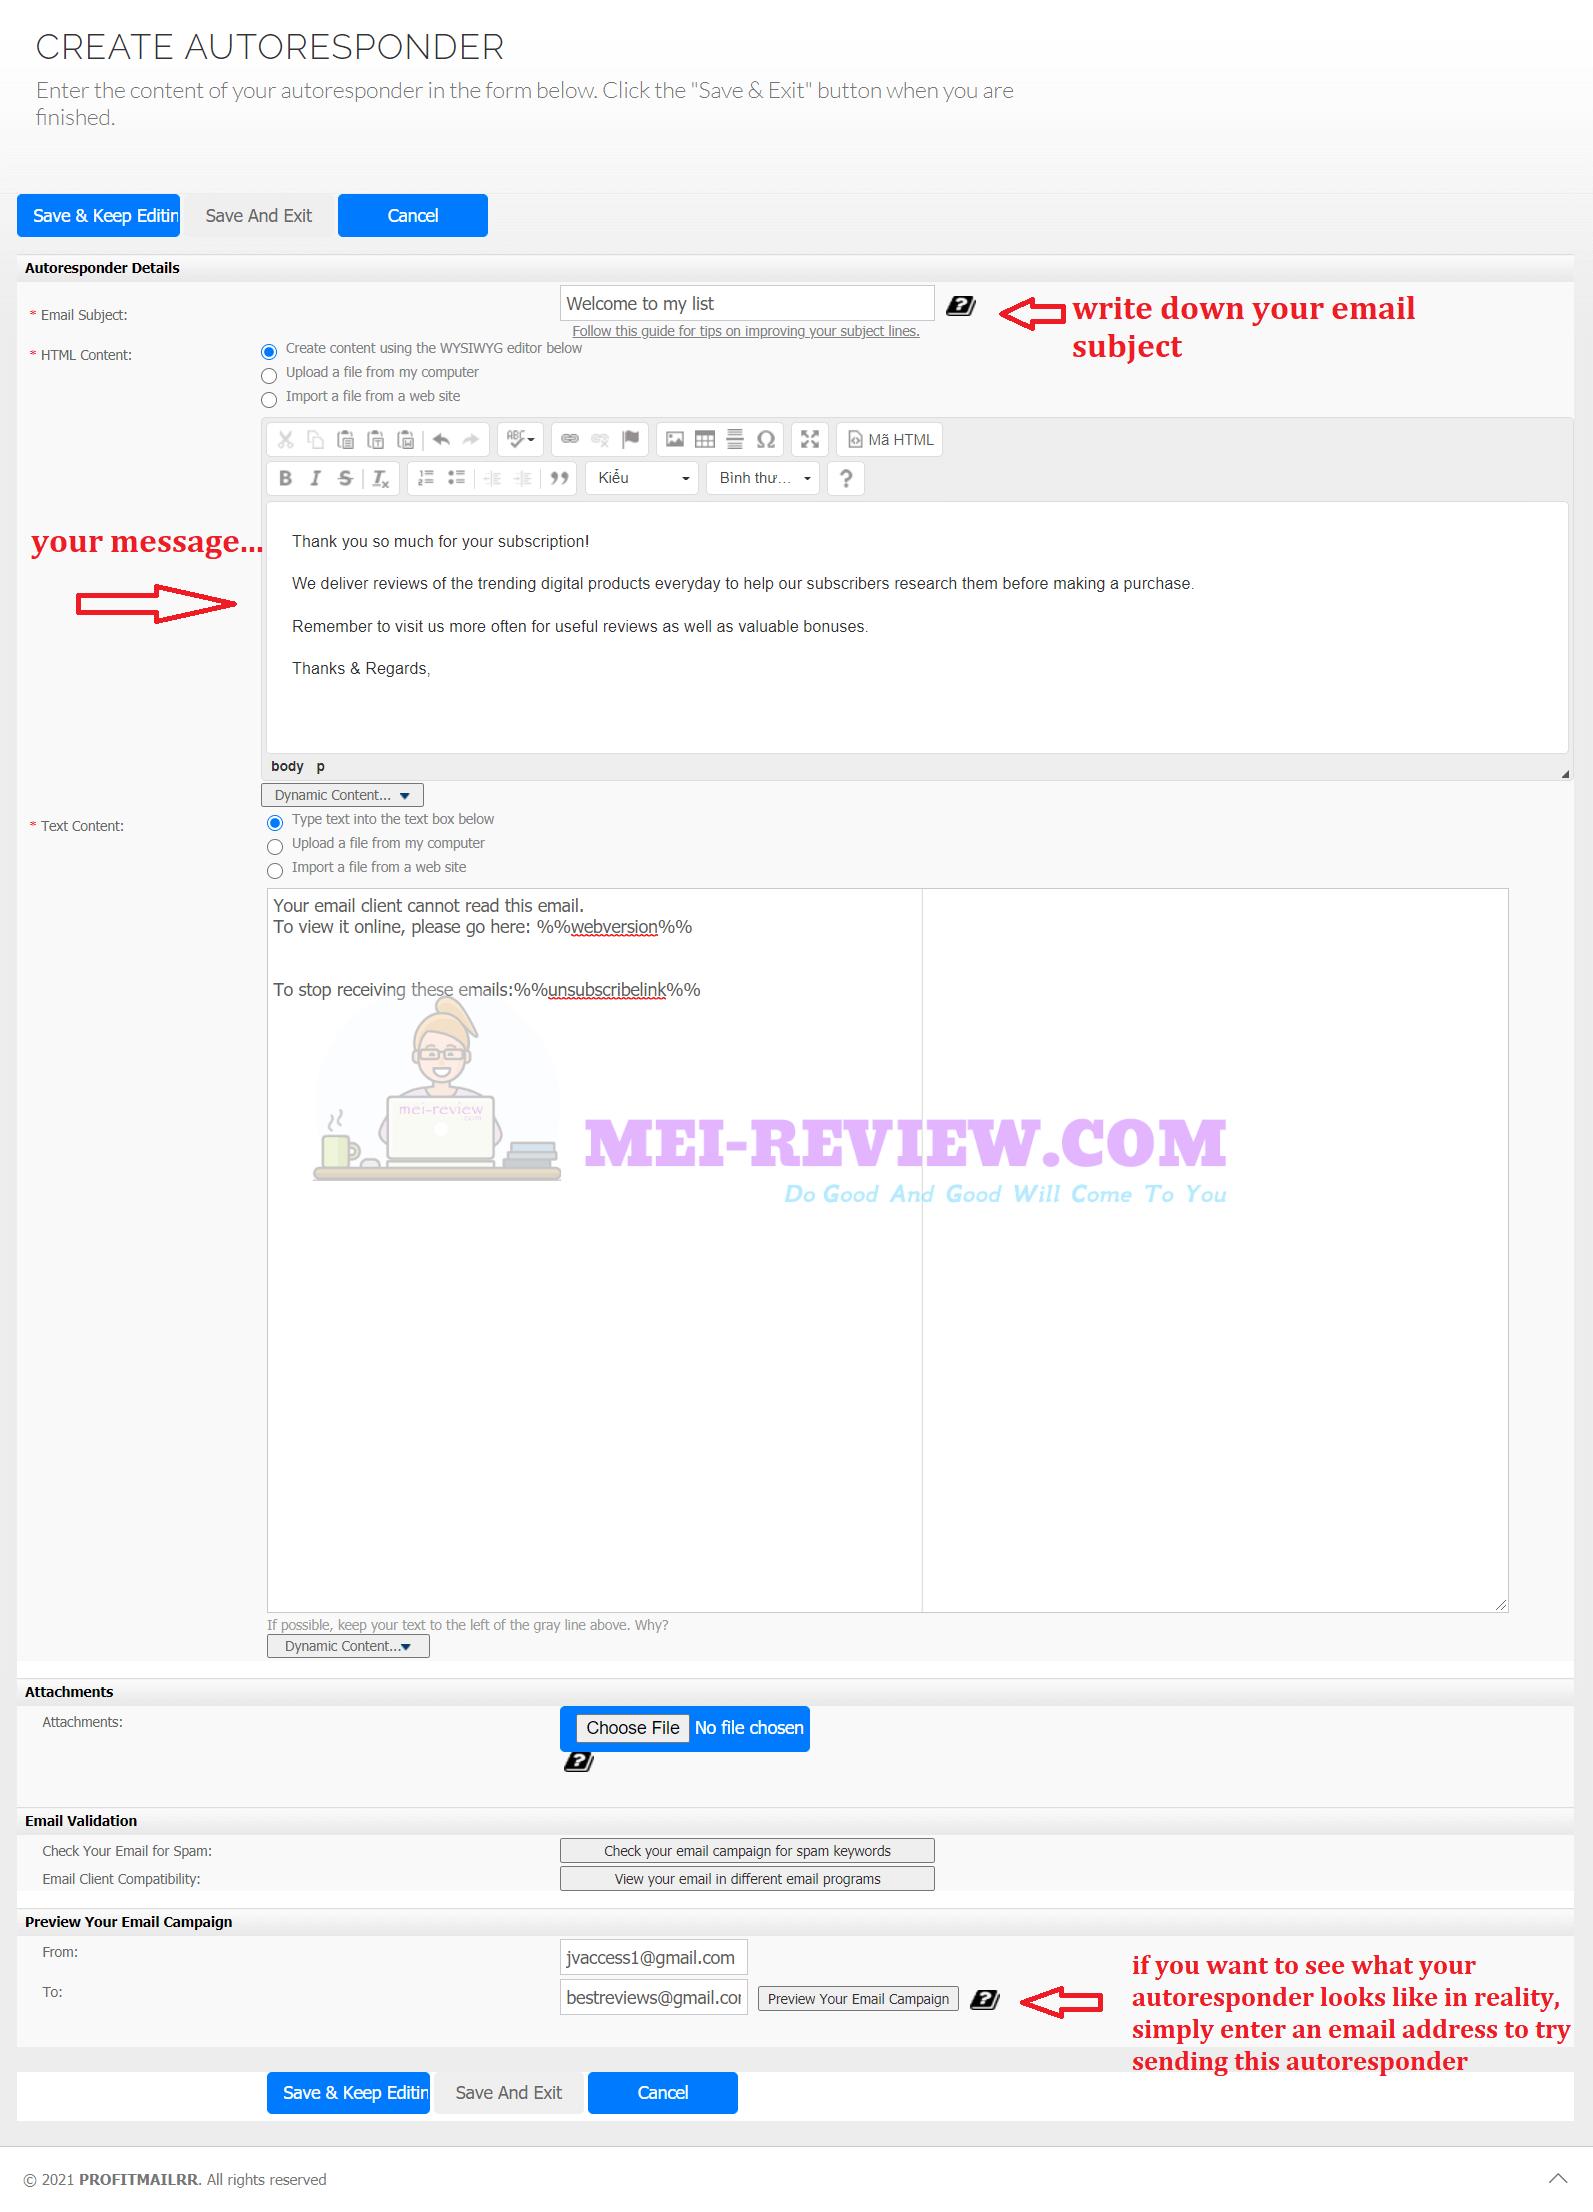 ProfitMailrr-create-autoresponder